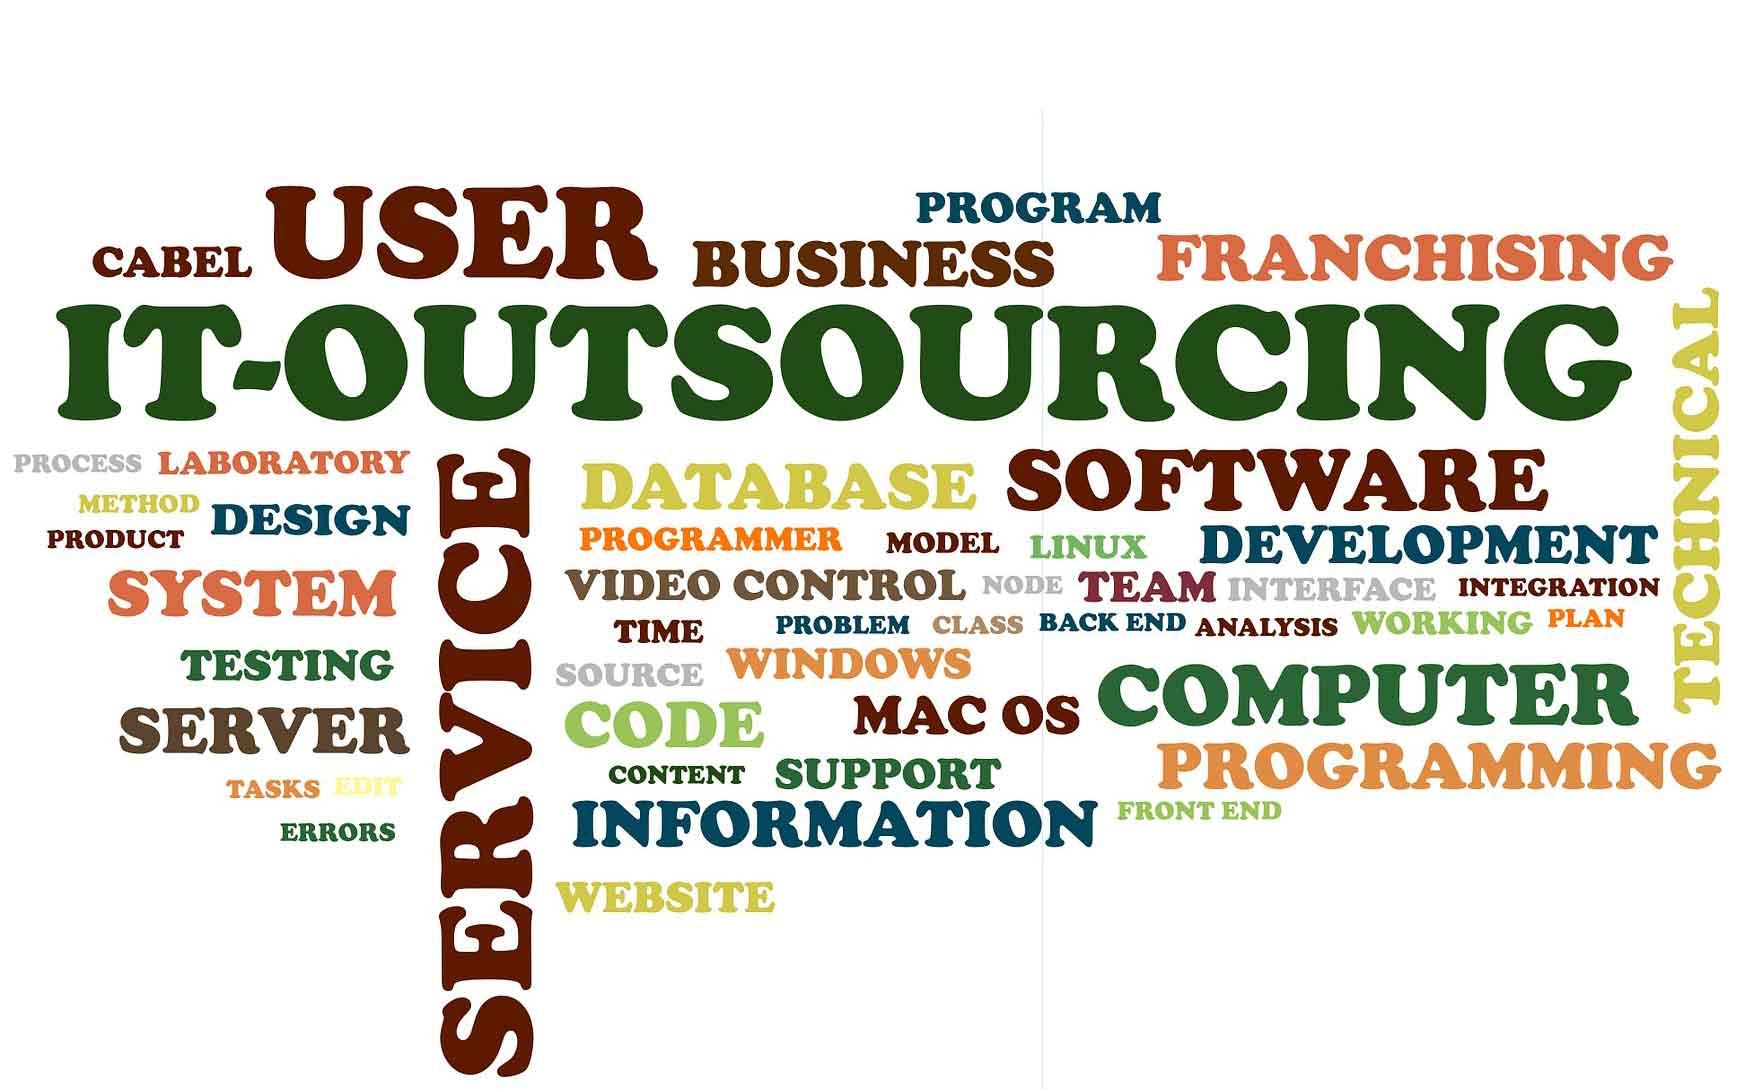 database design software quality metrics